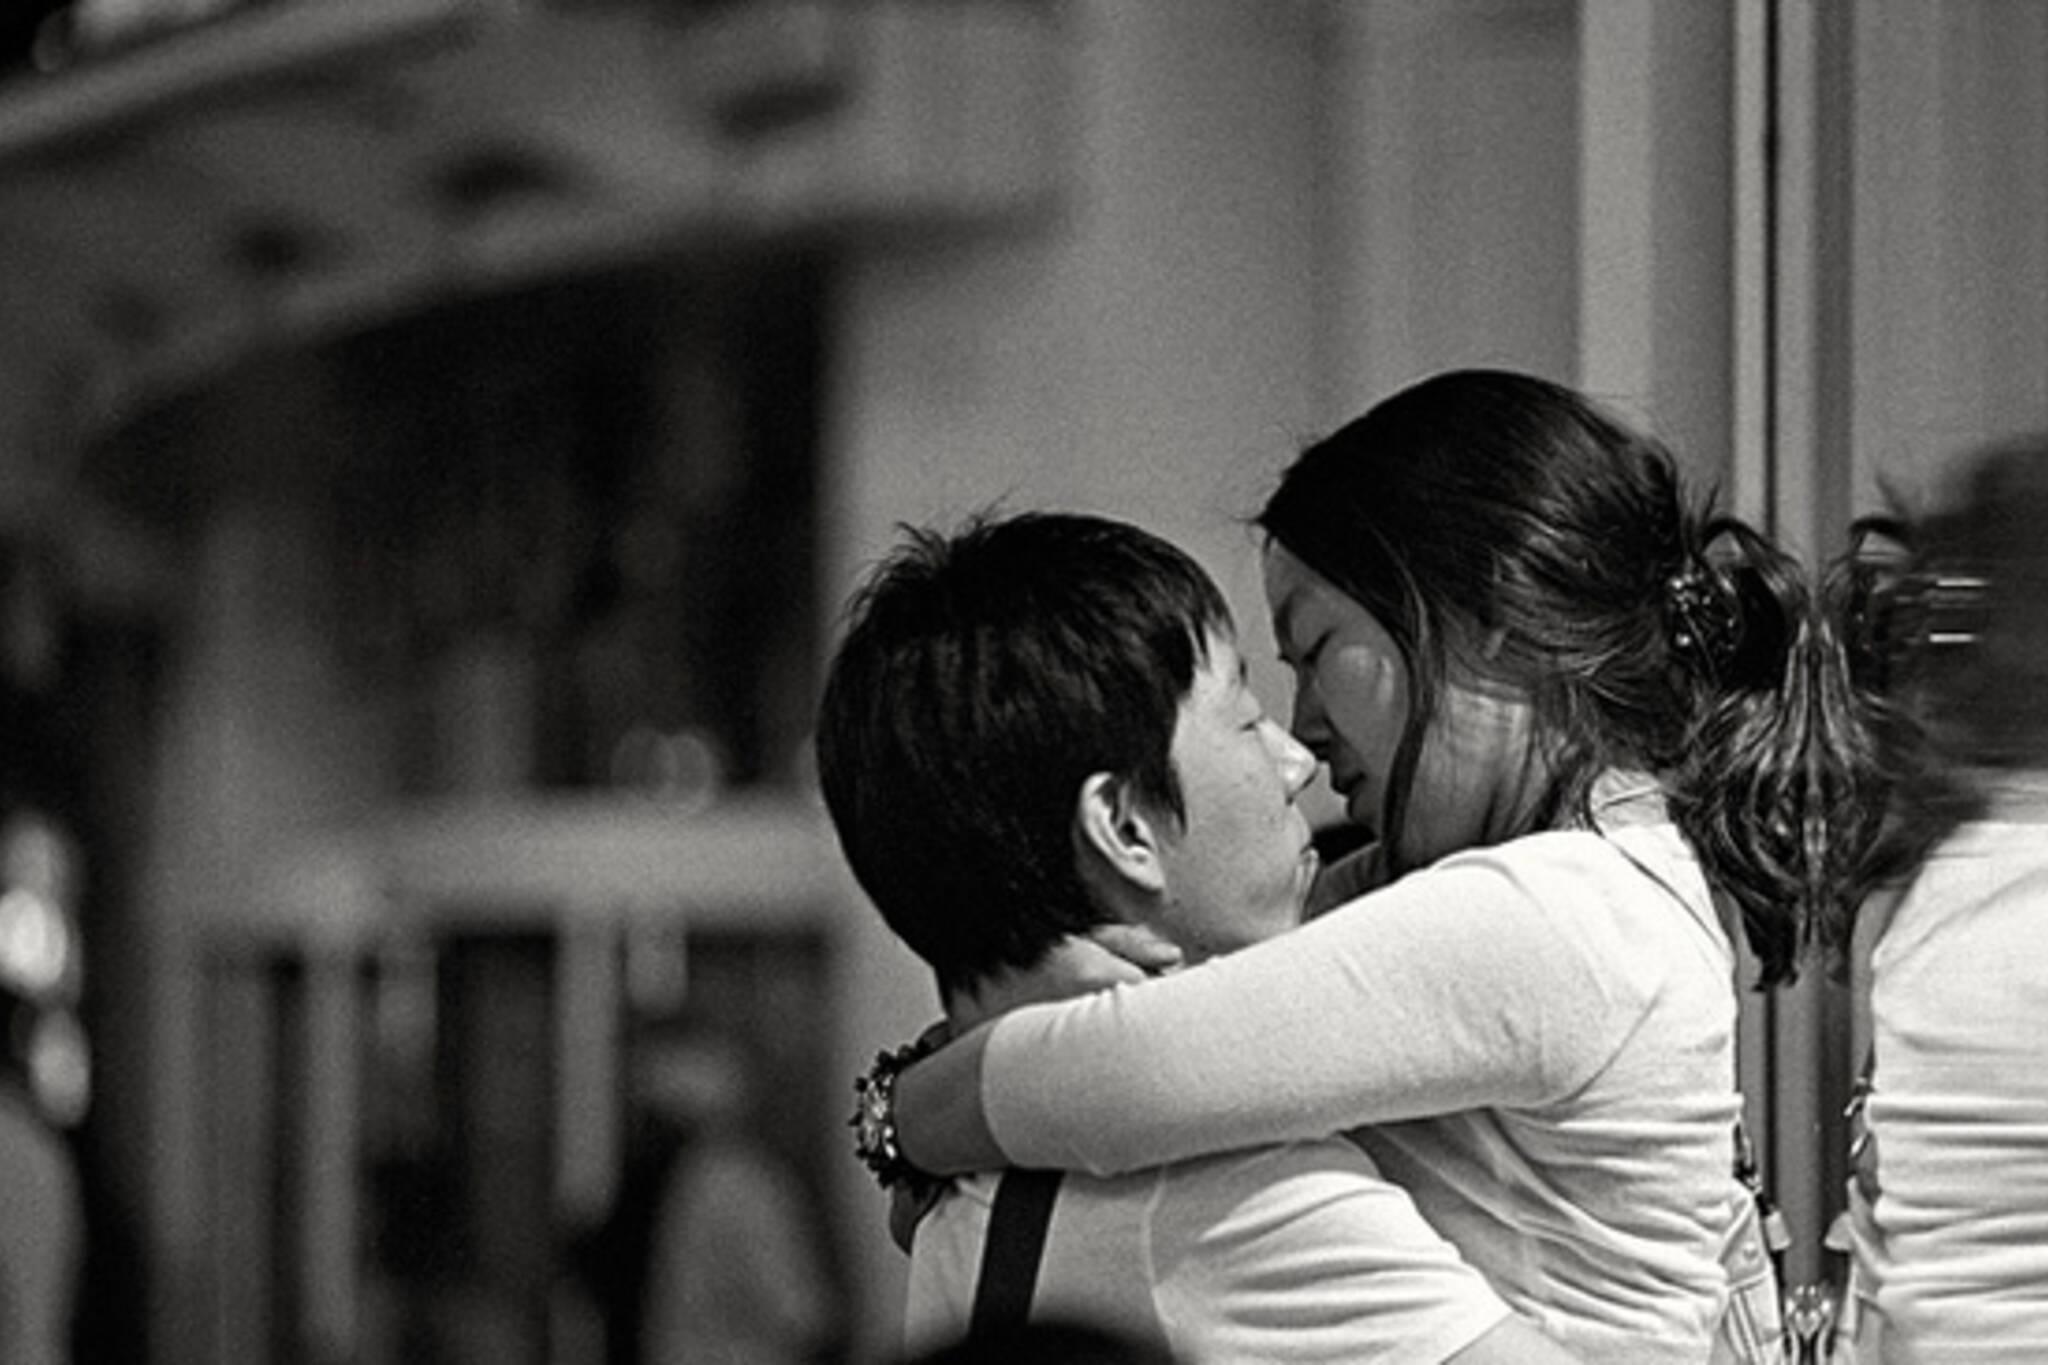 kiss, passion, street